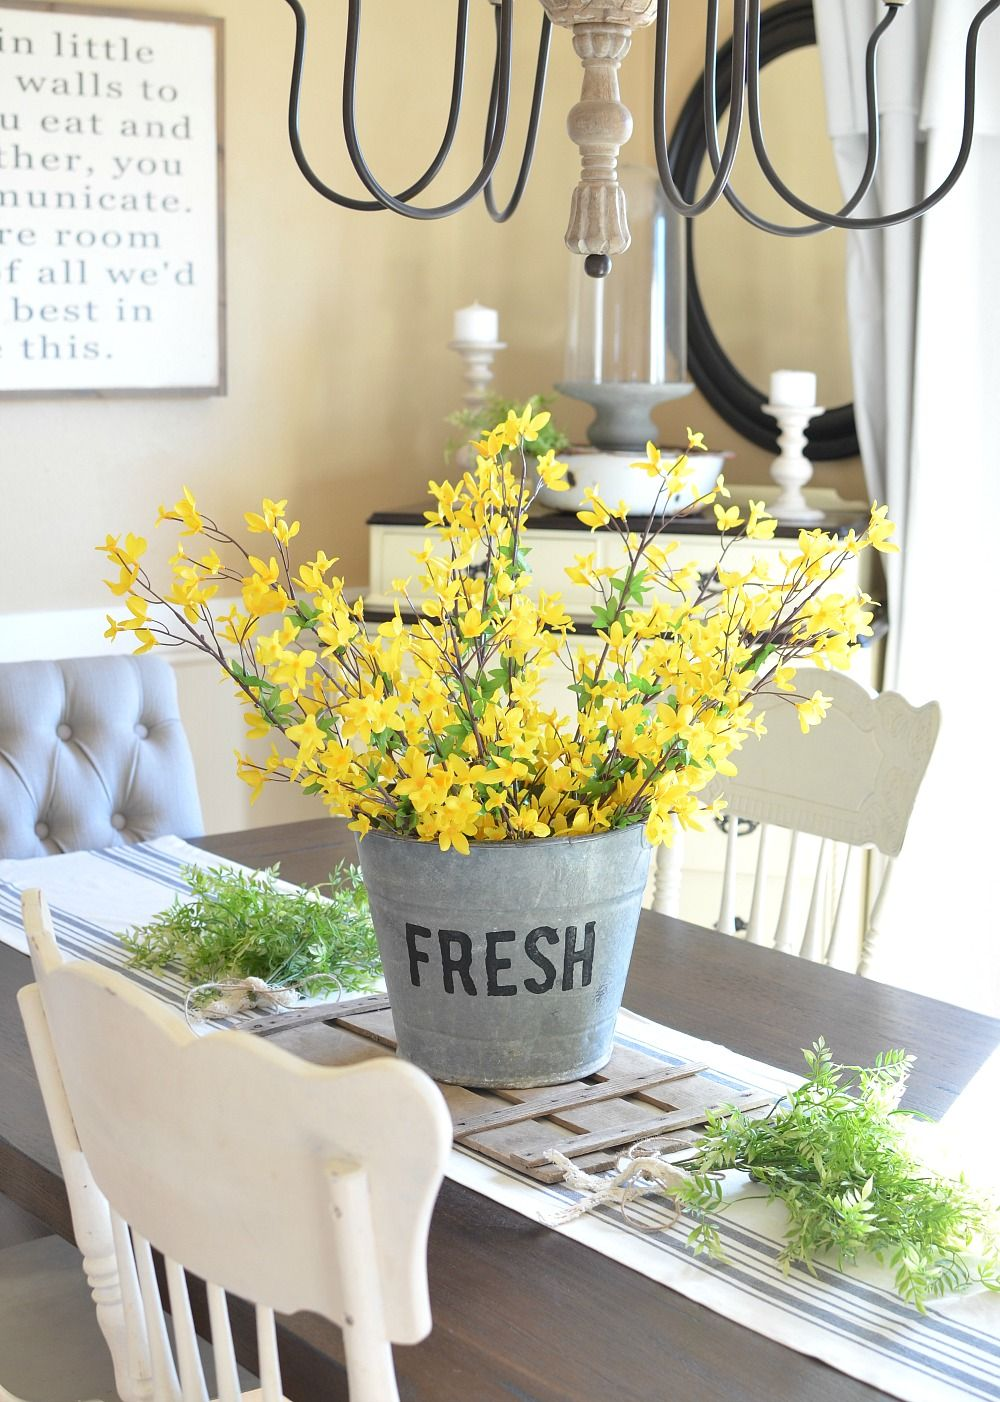 Diy Bucket Of Flowers Spring Centerpiece In 2020 Farmhouse Centerpiece Spring Home Decor Summer Home Decor